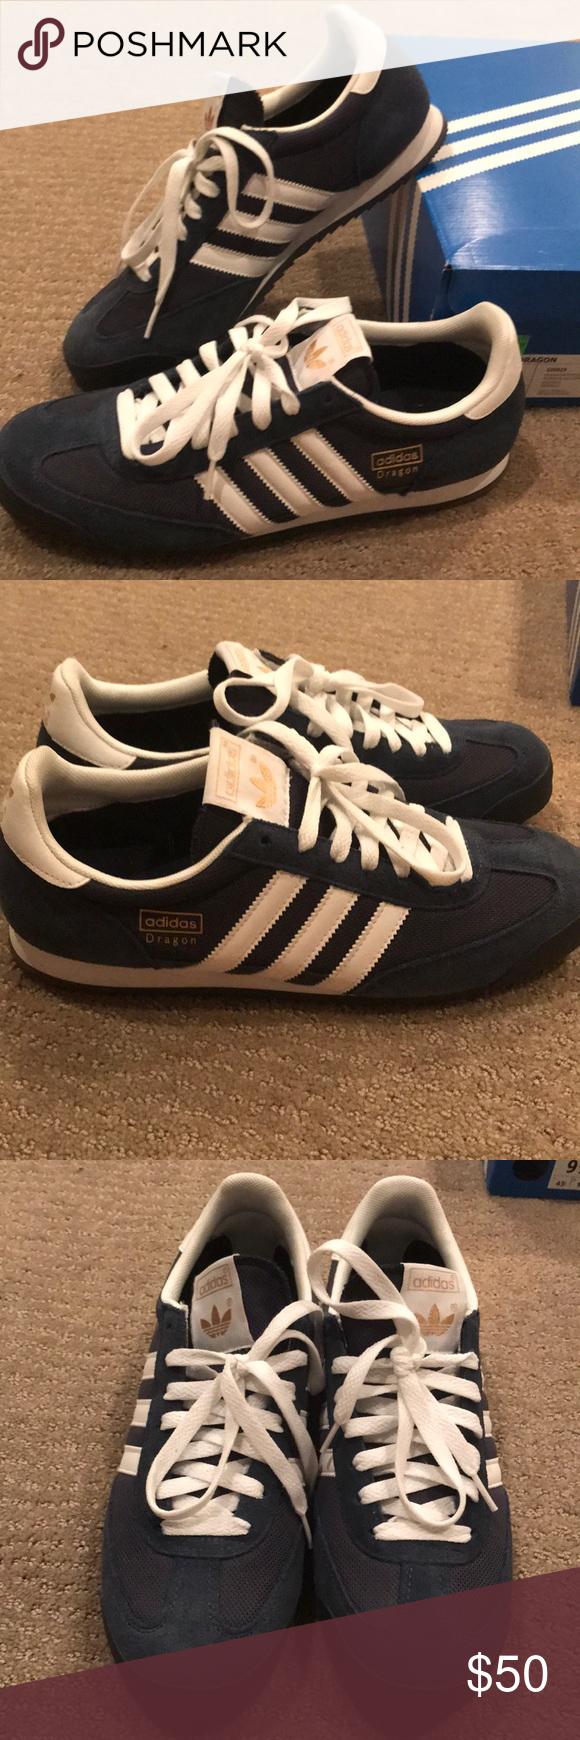 Men'a Adidas Dragon Like New | Adidas dragon, Adidas originals ...